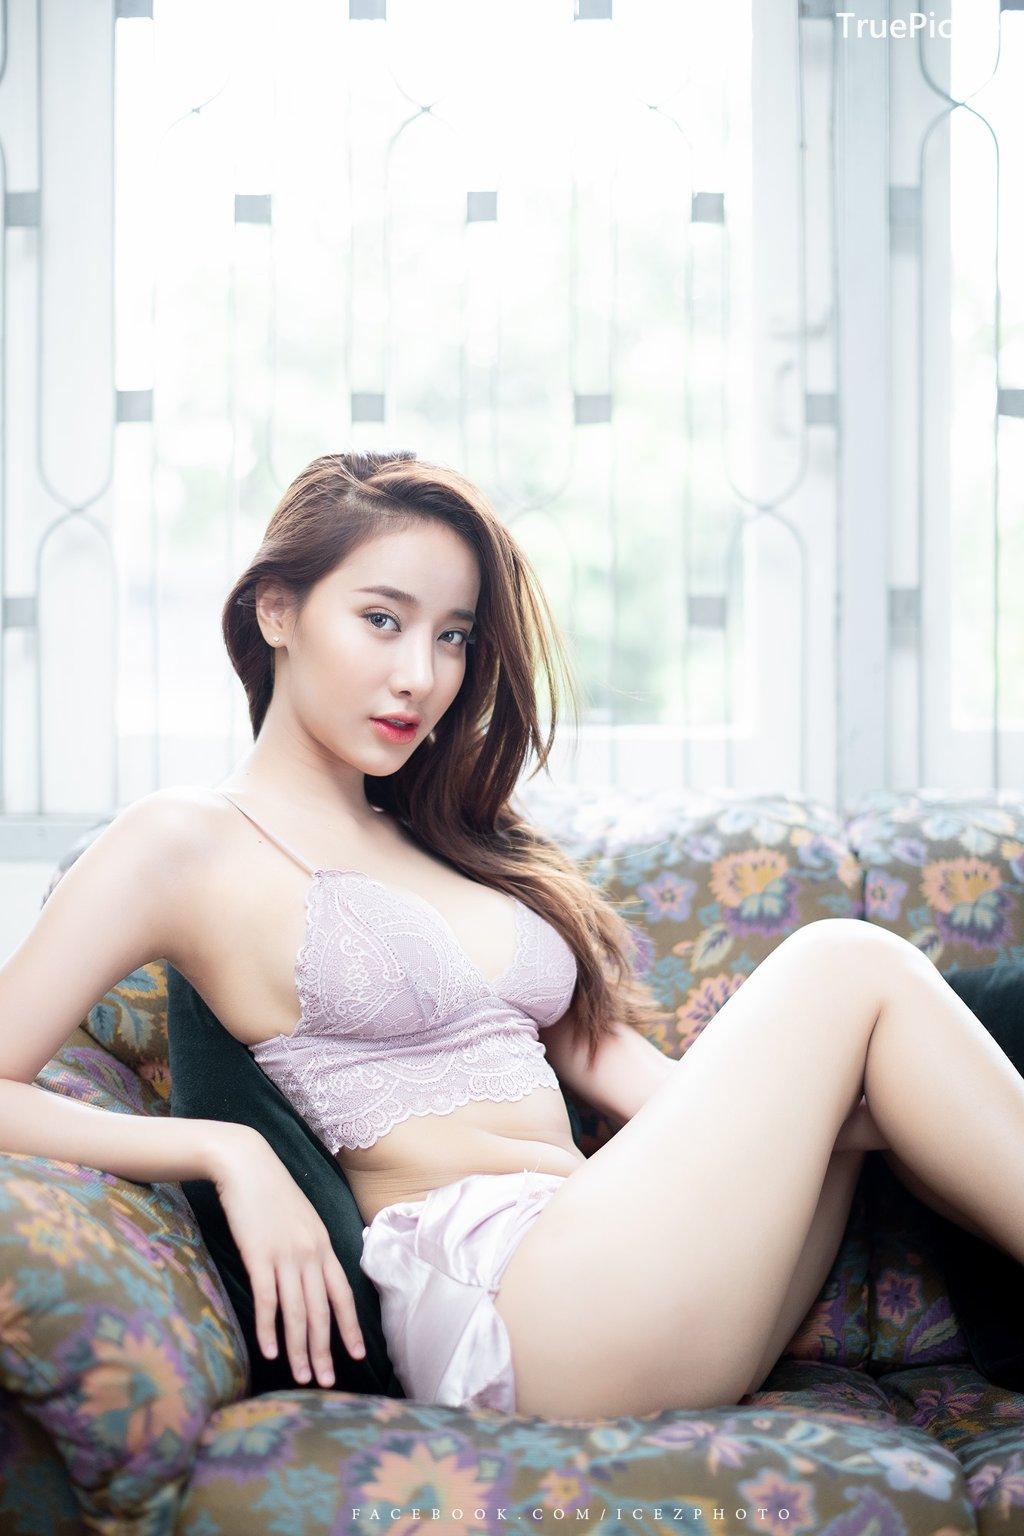 Image-Thailand-Hot-Model-Pichana-Yoosuk-Sexy-Purple-Bra-Shiny-Short-Pants-TruePic.net- Picture-1